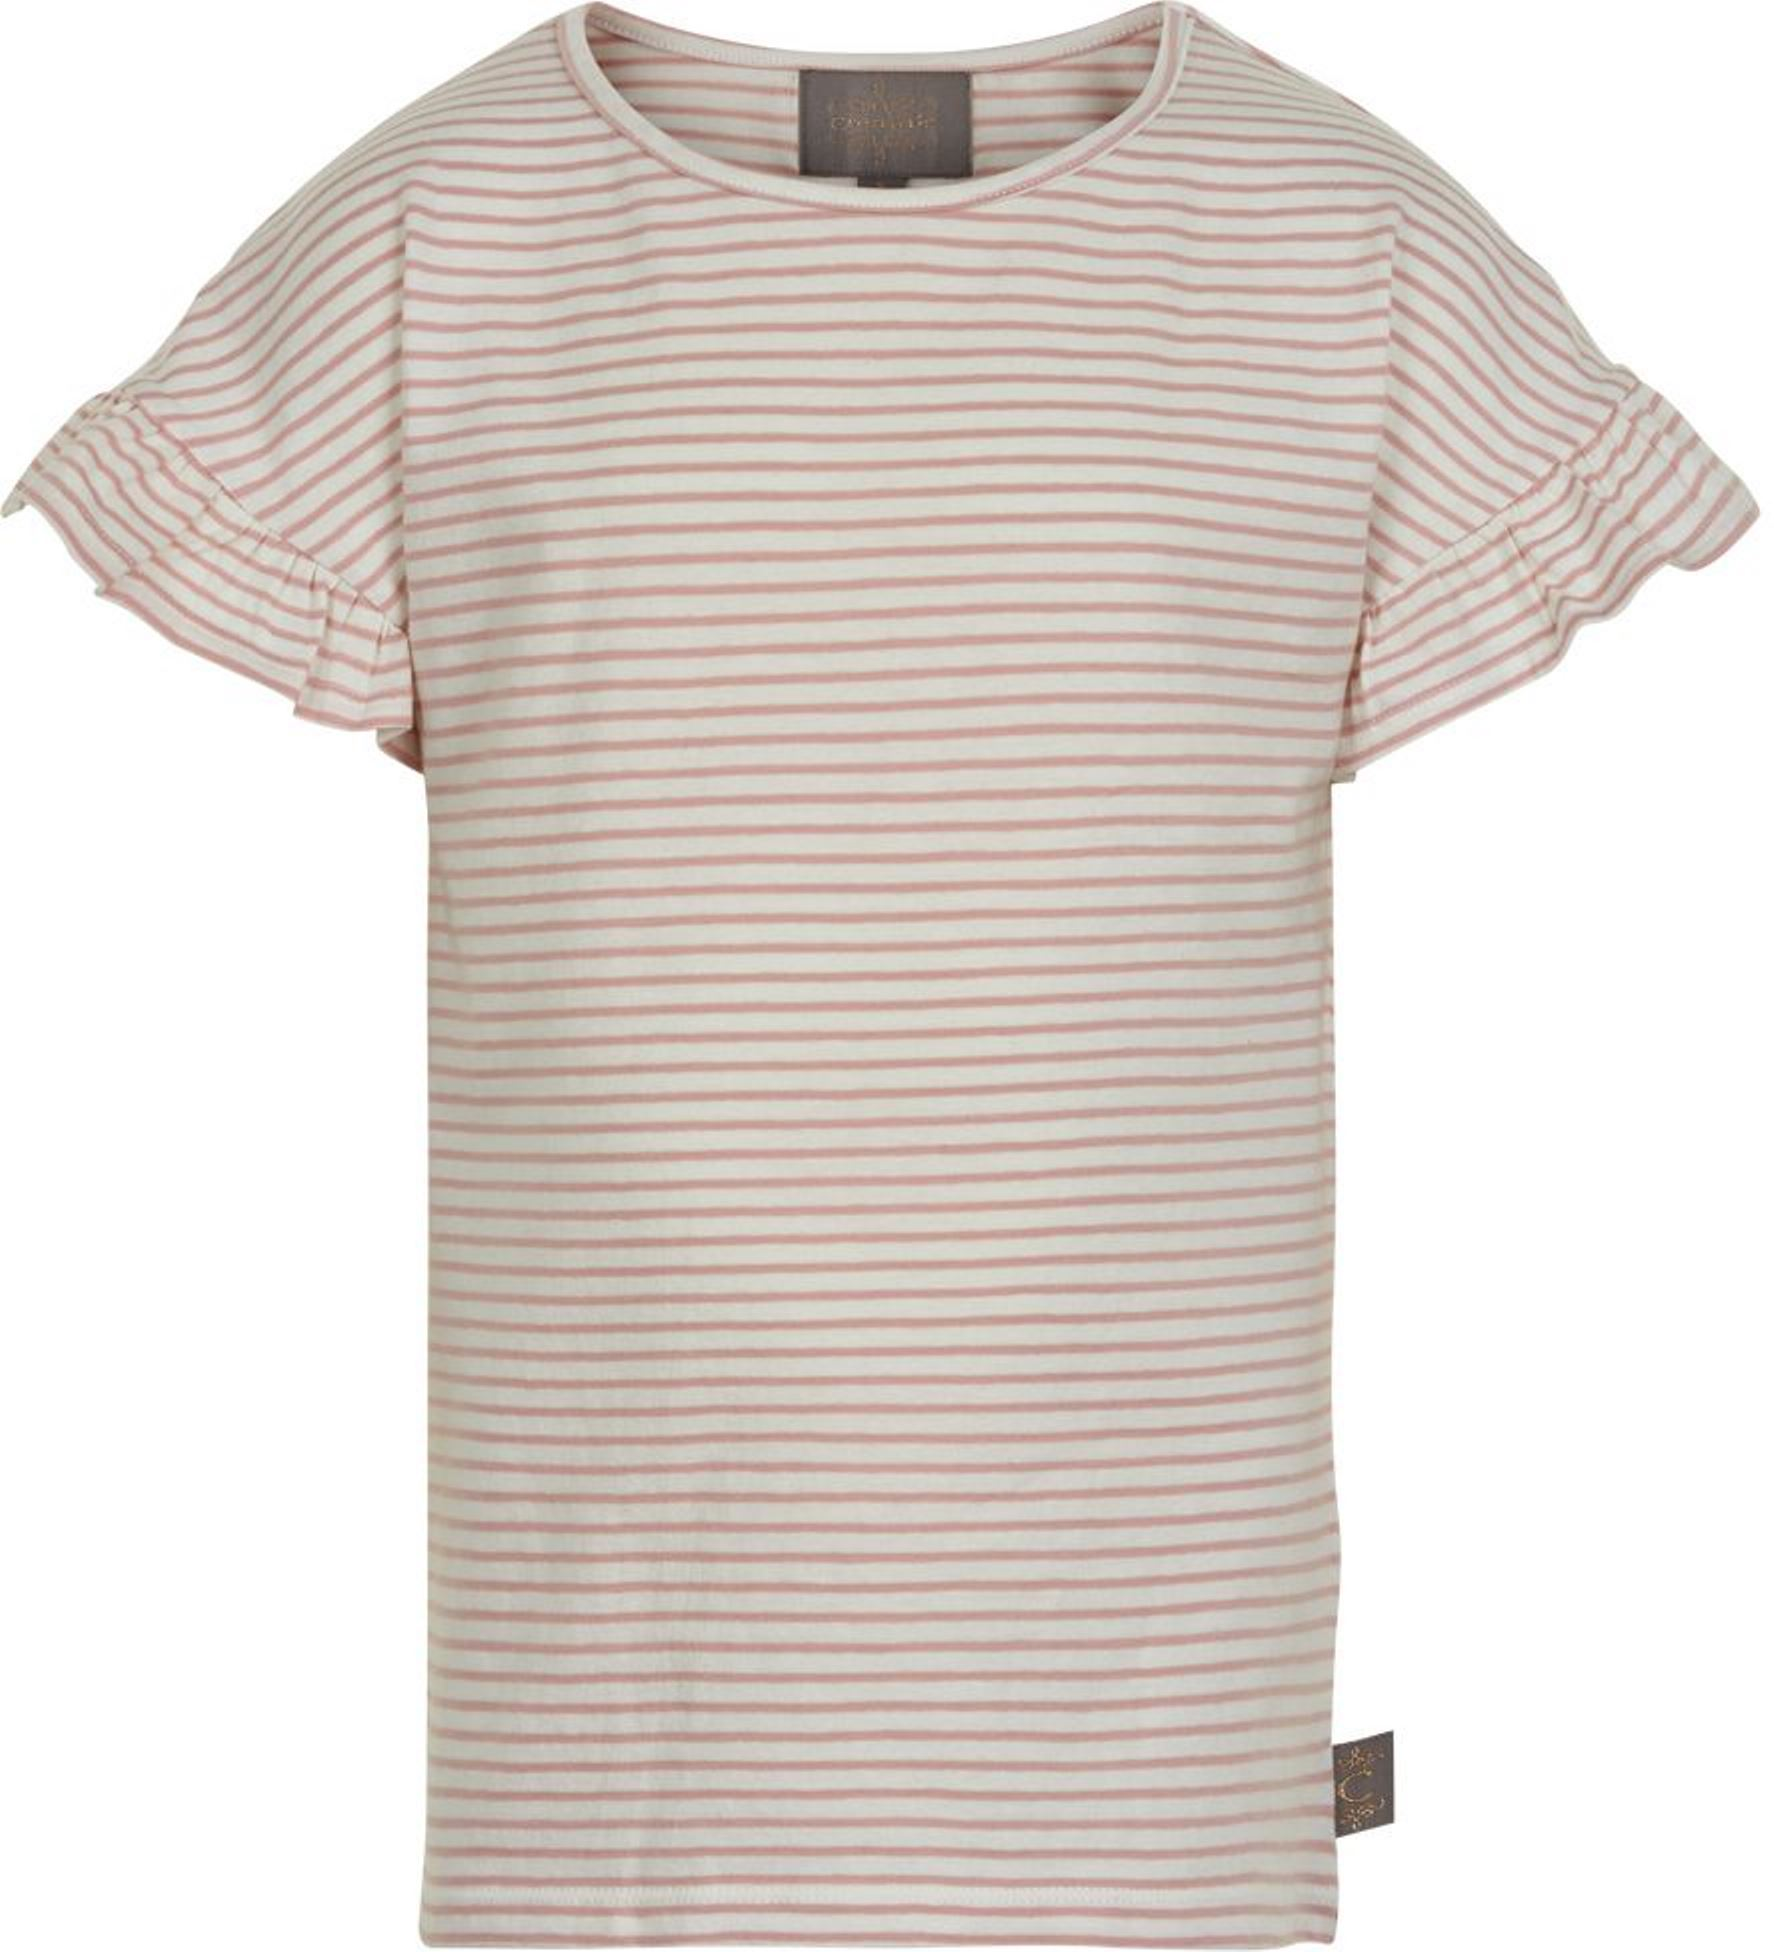 Creamie Kurzarmshirt Stripe rose